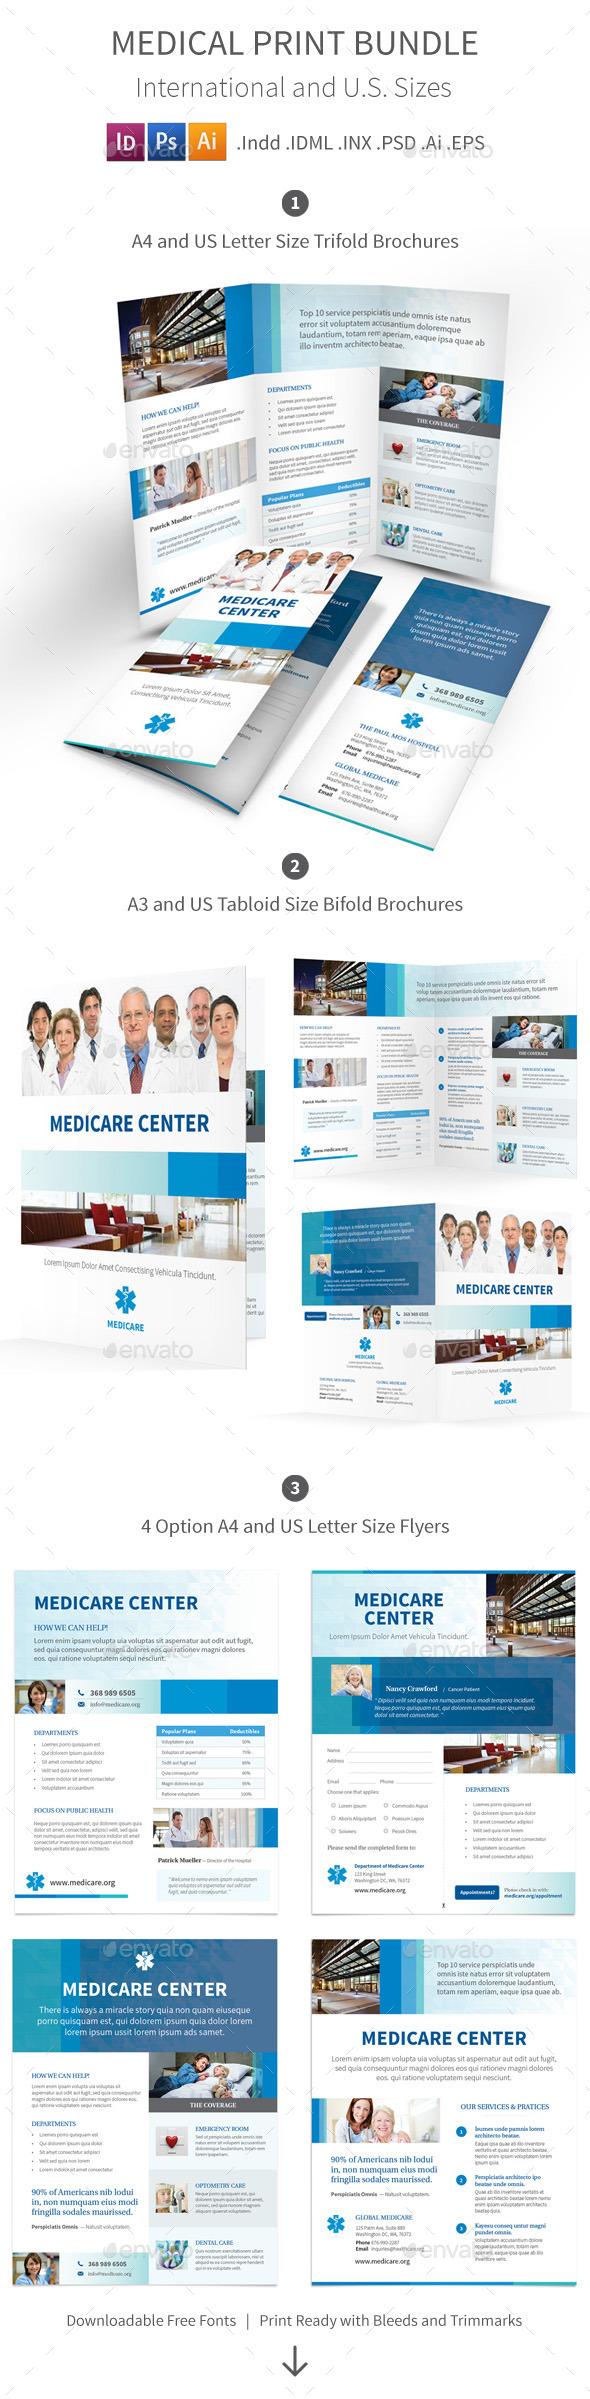 GraphicRiver Medical Print Bundle 9585599